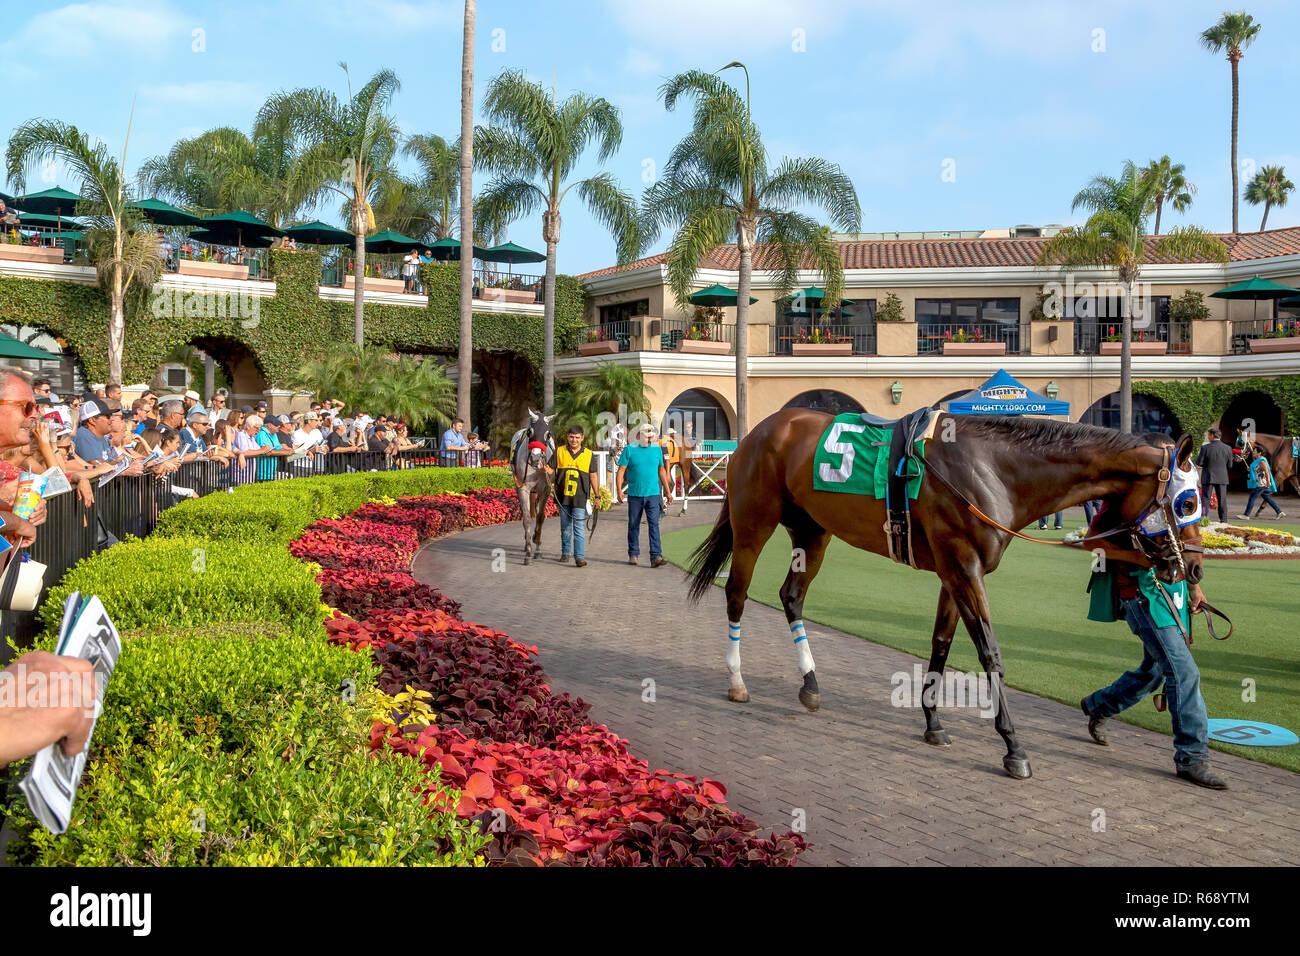 Showcasing several horses before the race in Del Mar, California - Stock Image